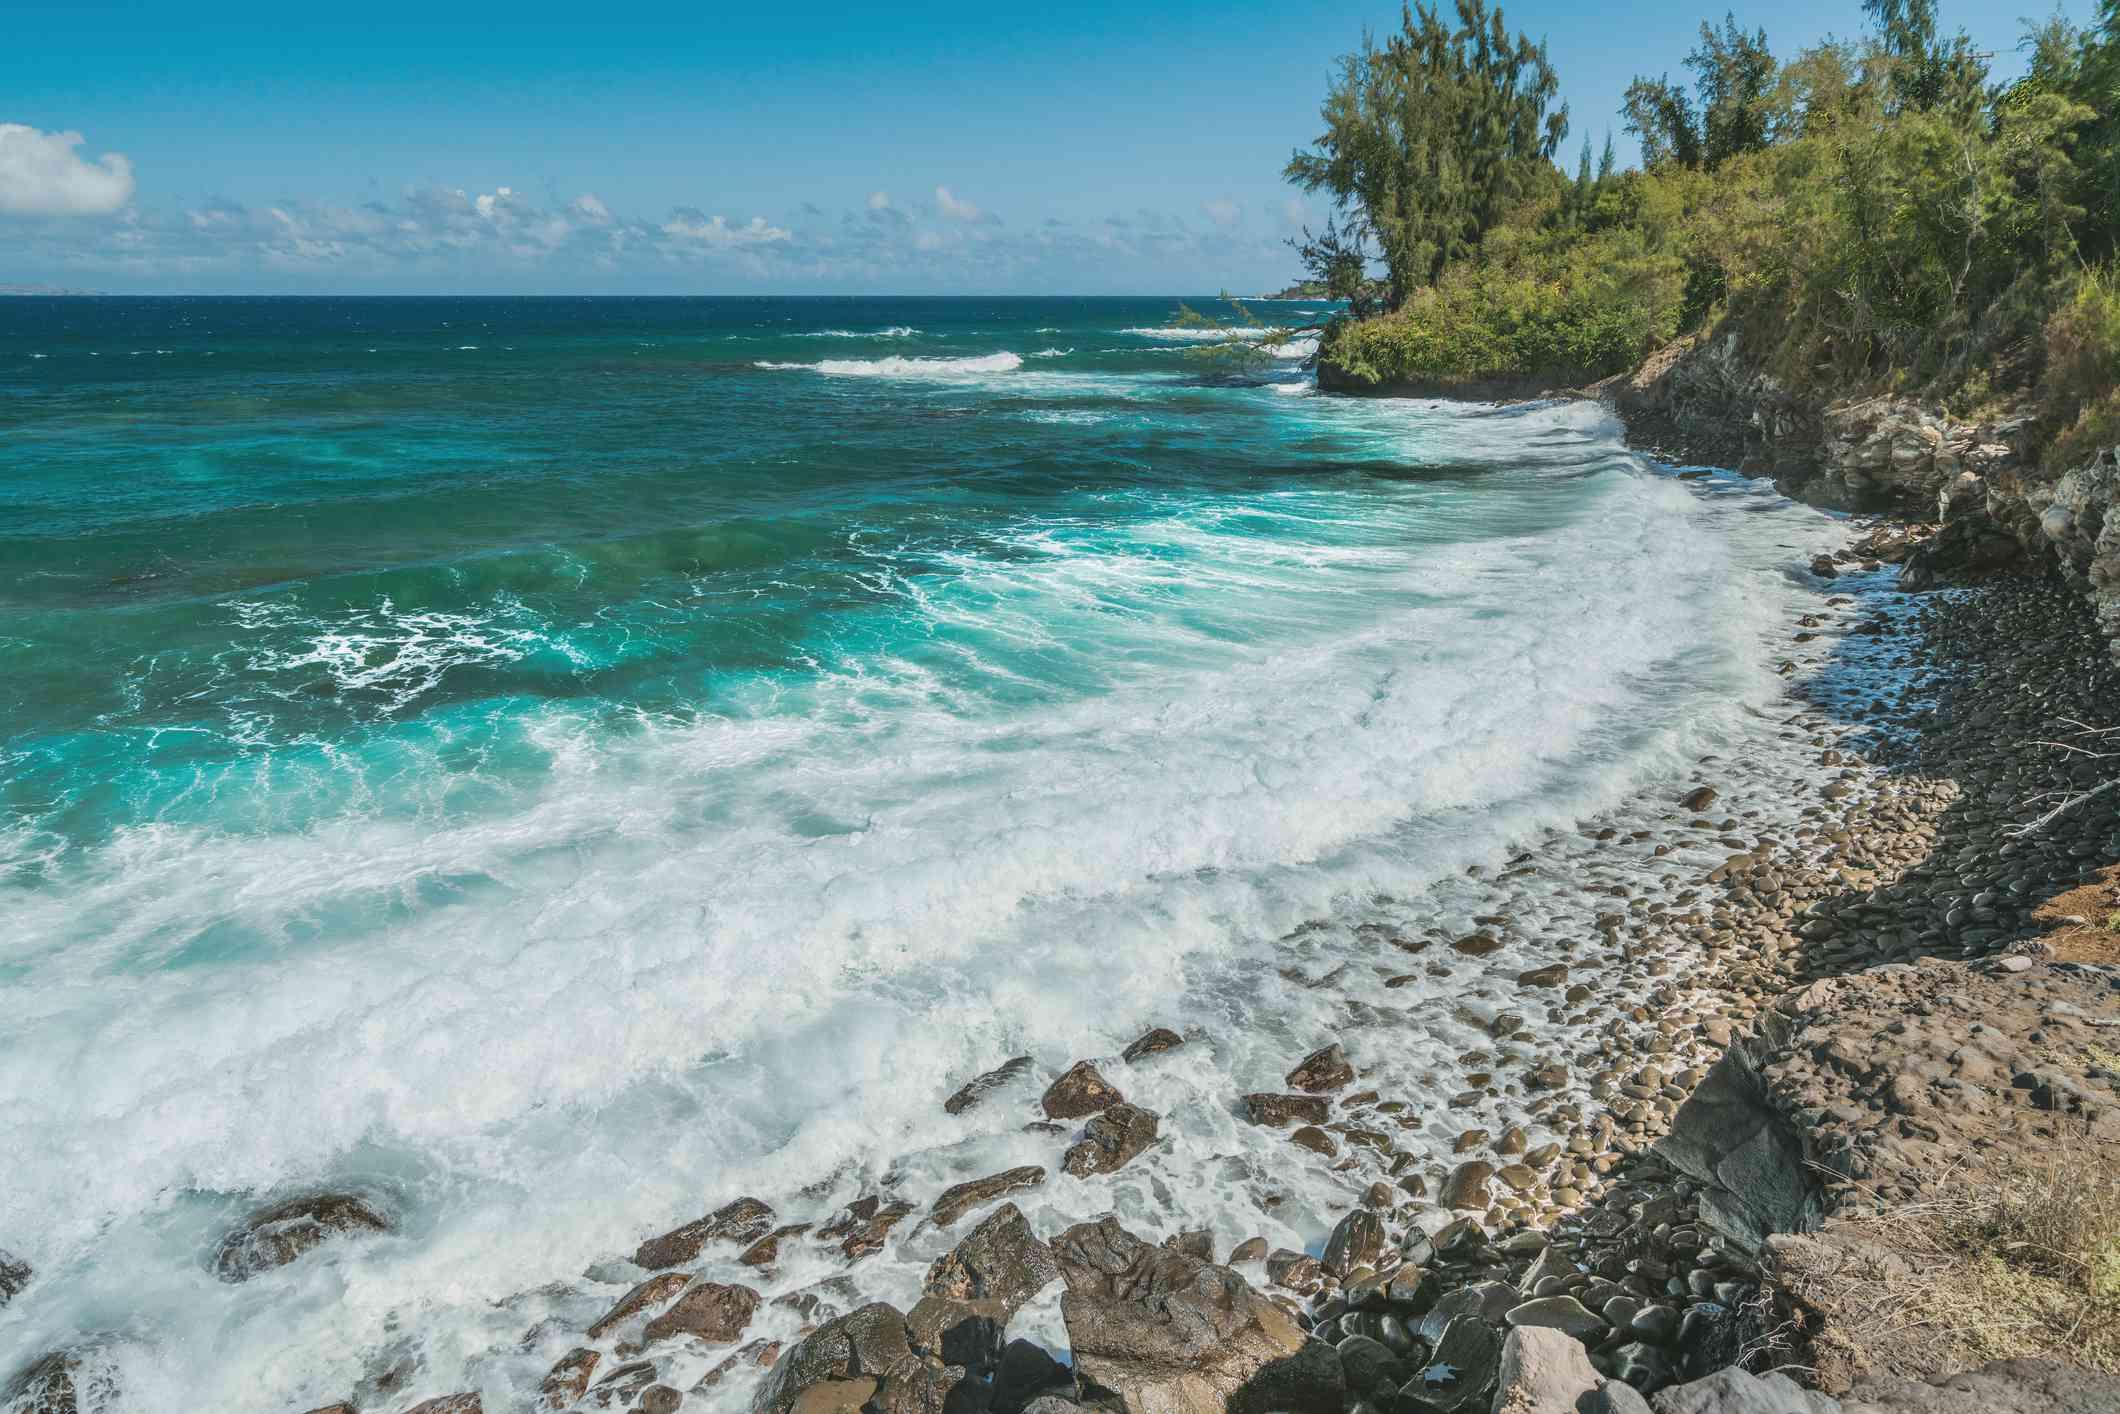 D.T. Fleming Beach Park on Maui